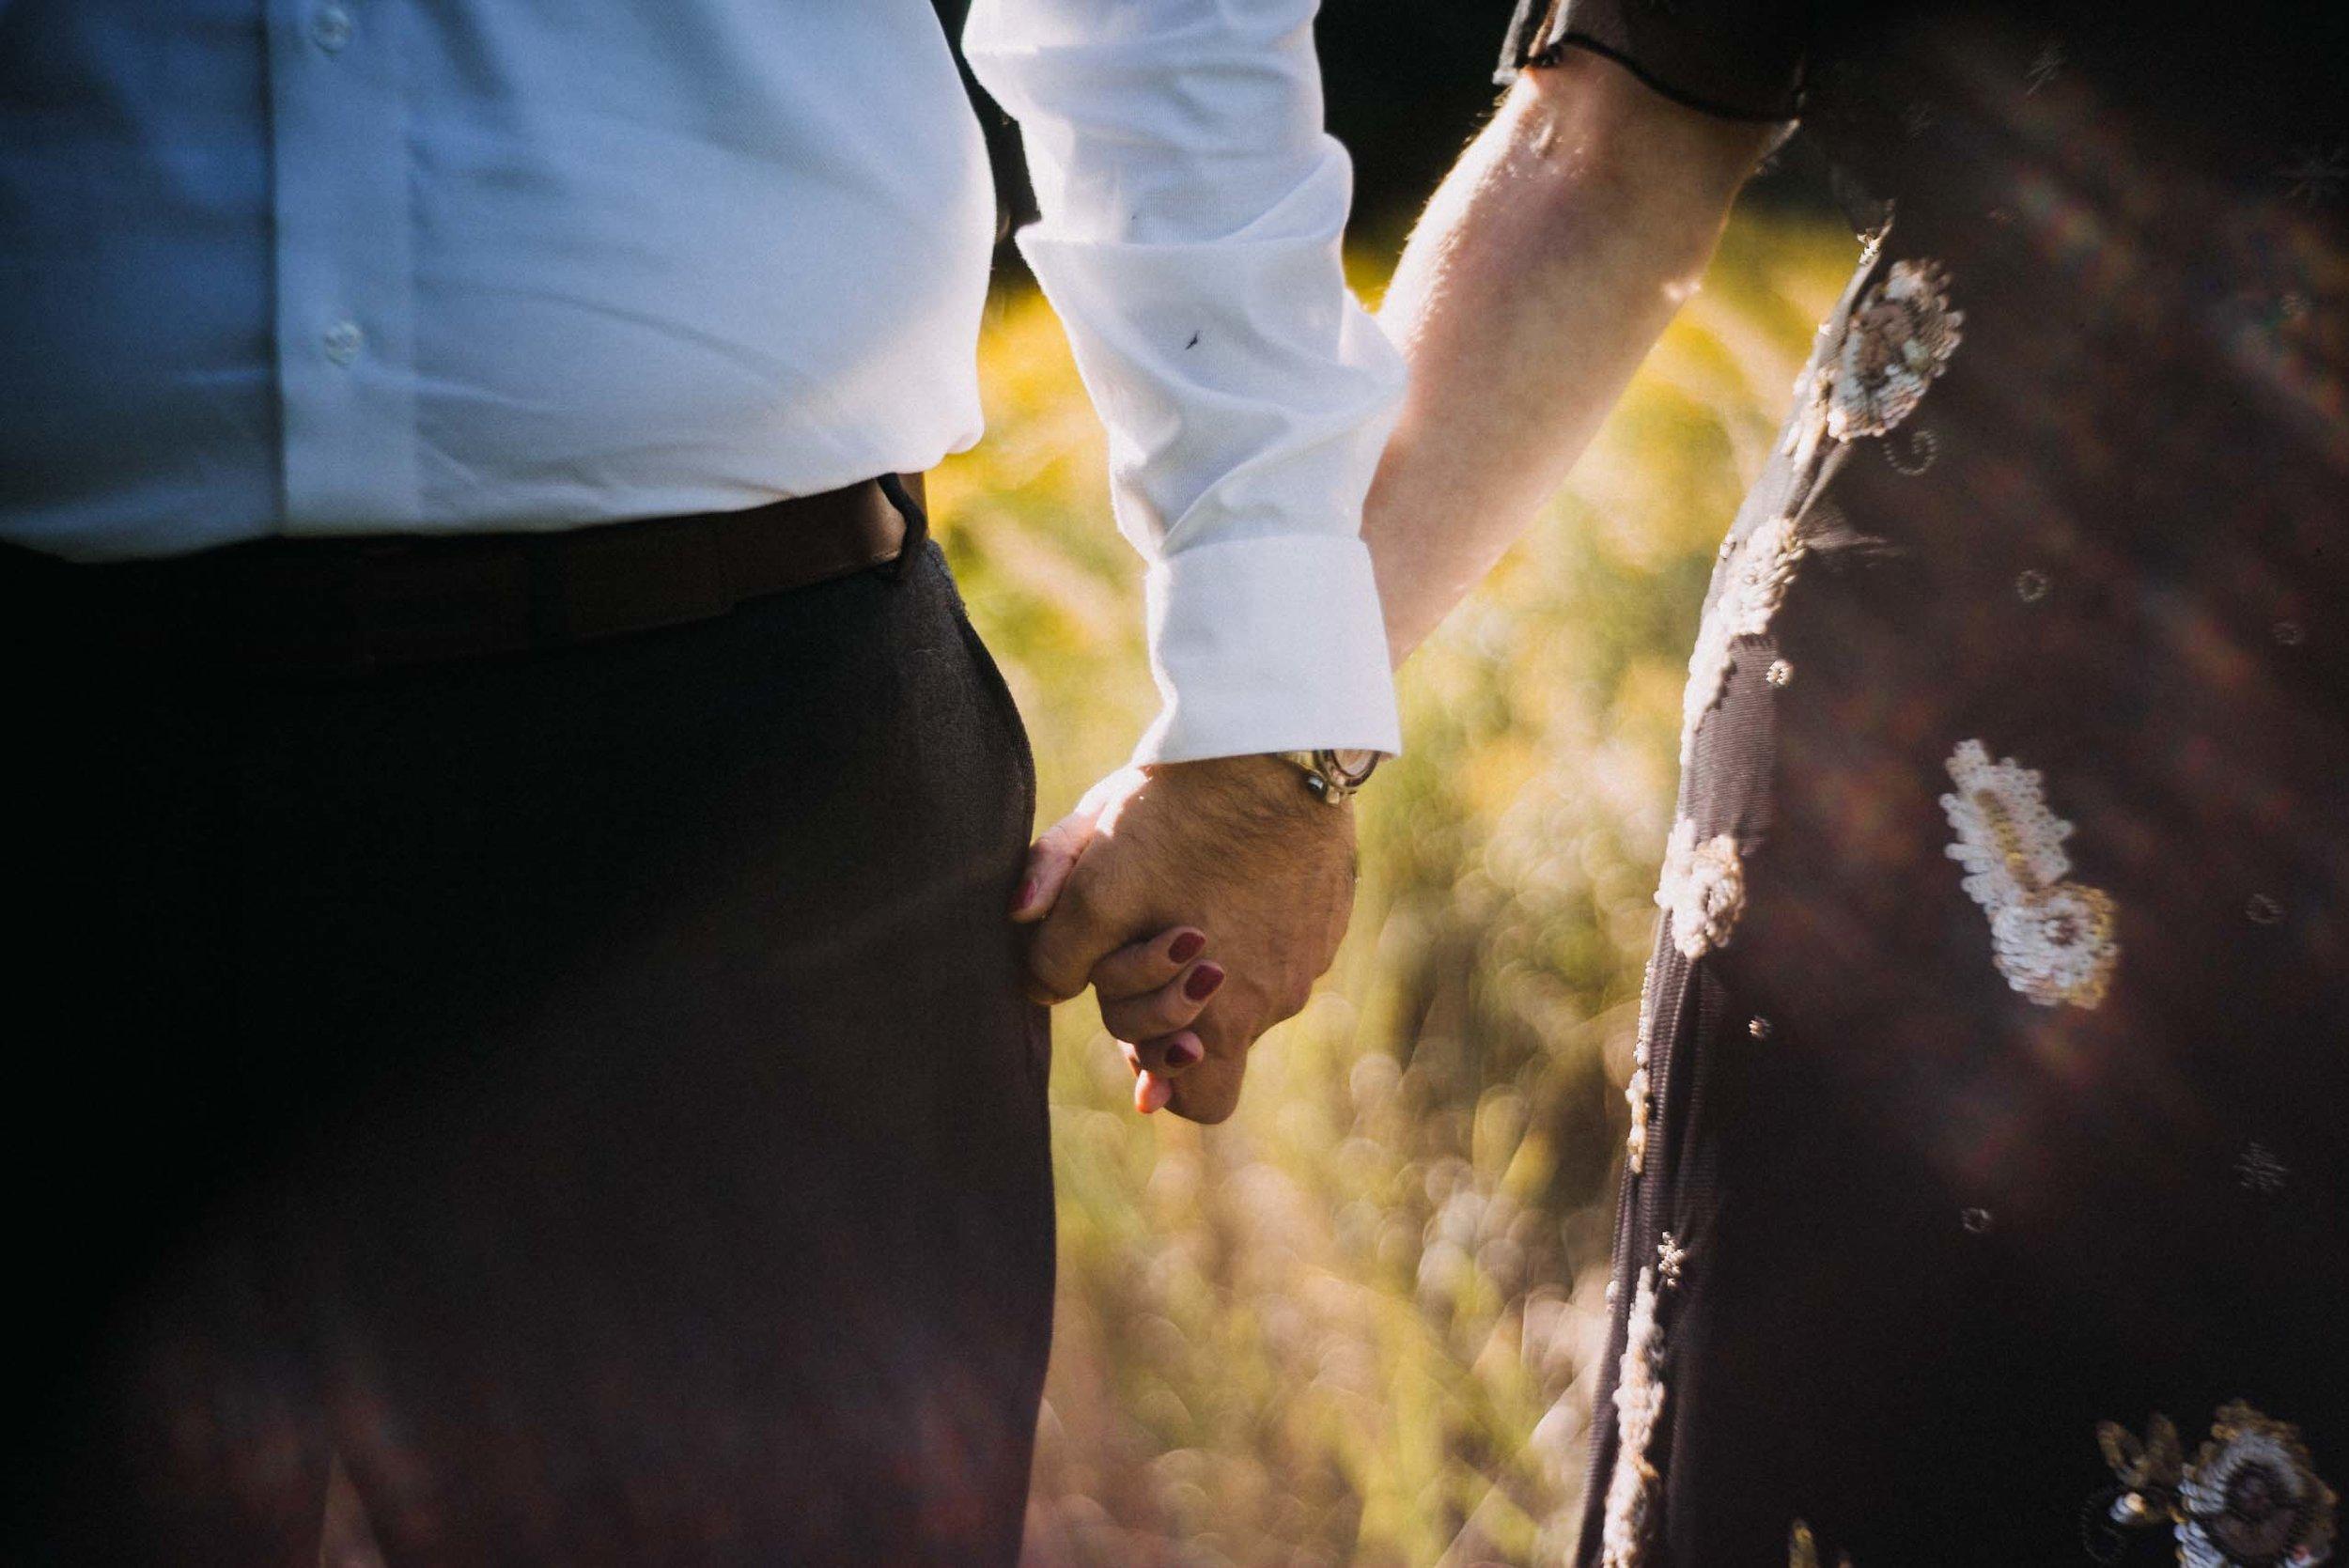 bayfield_madeline_island_wisconsin_wedding_engagement_session-5207.JPG